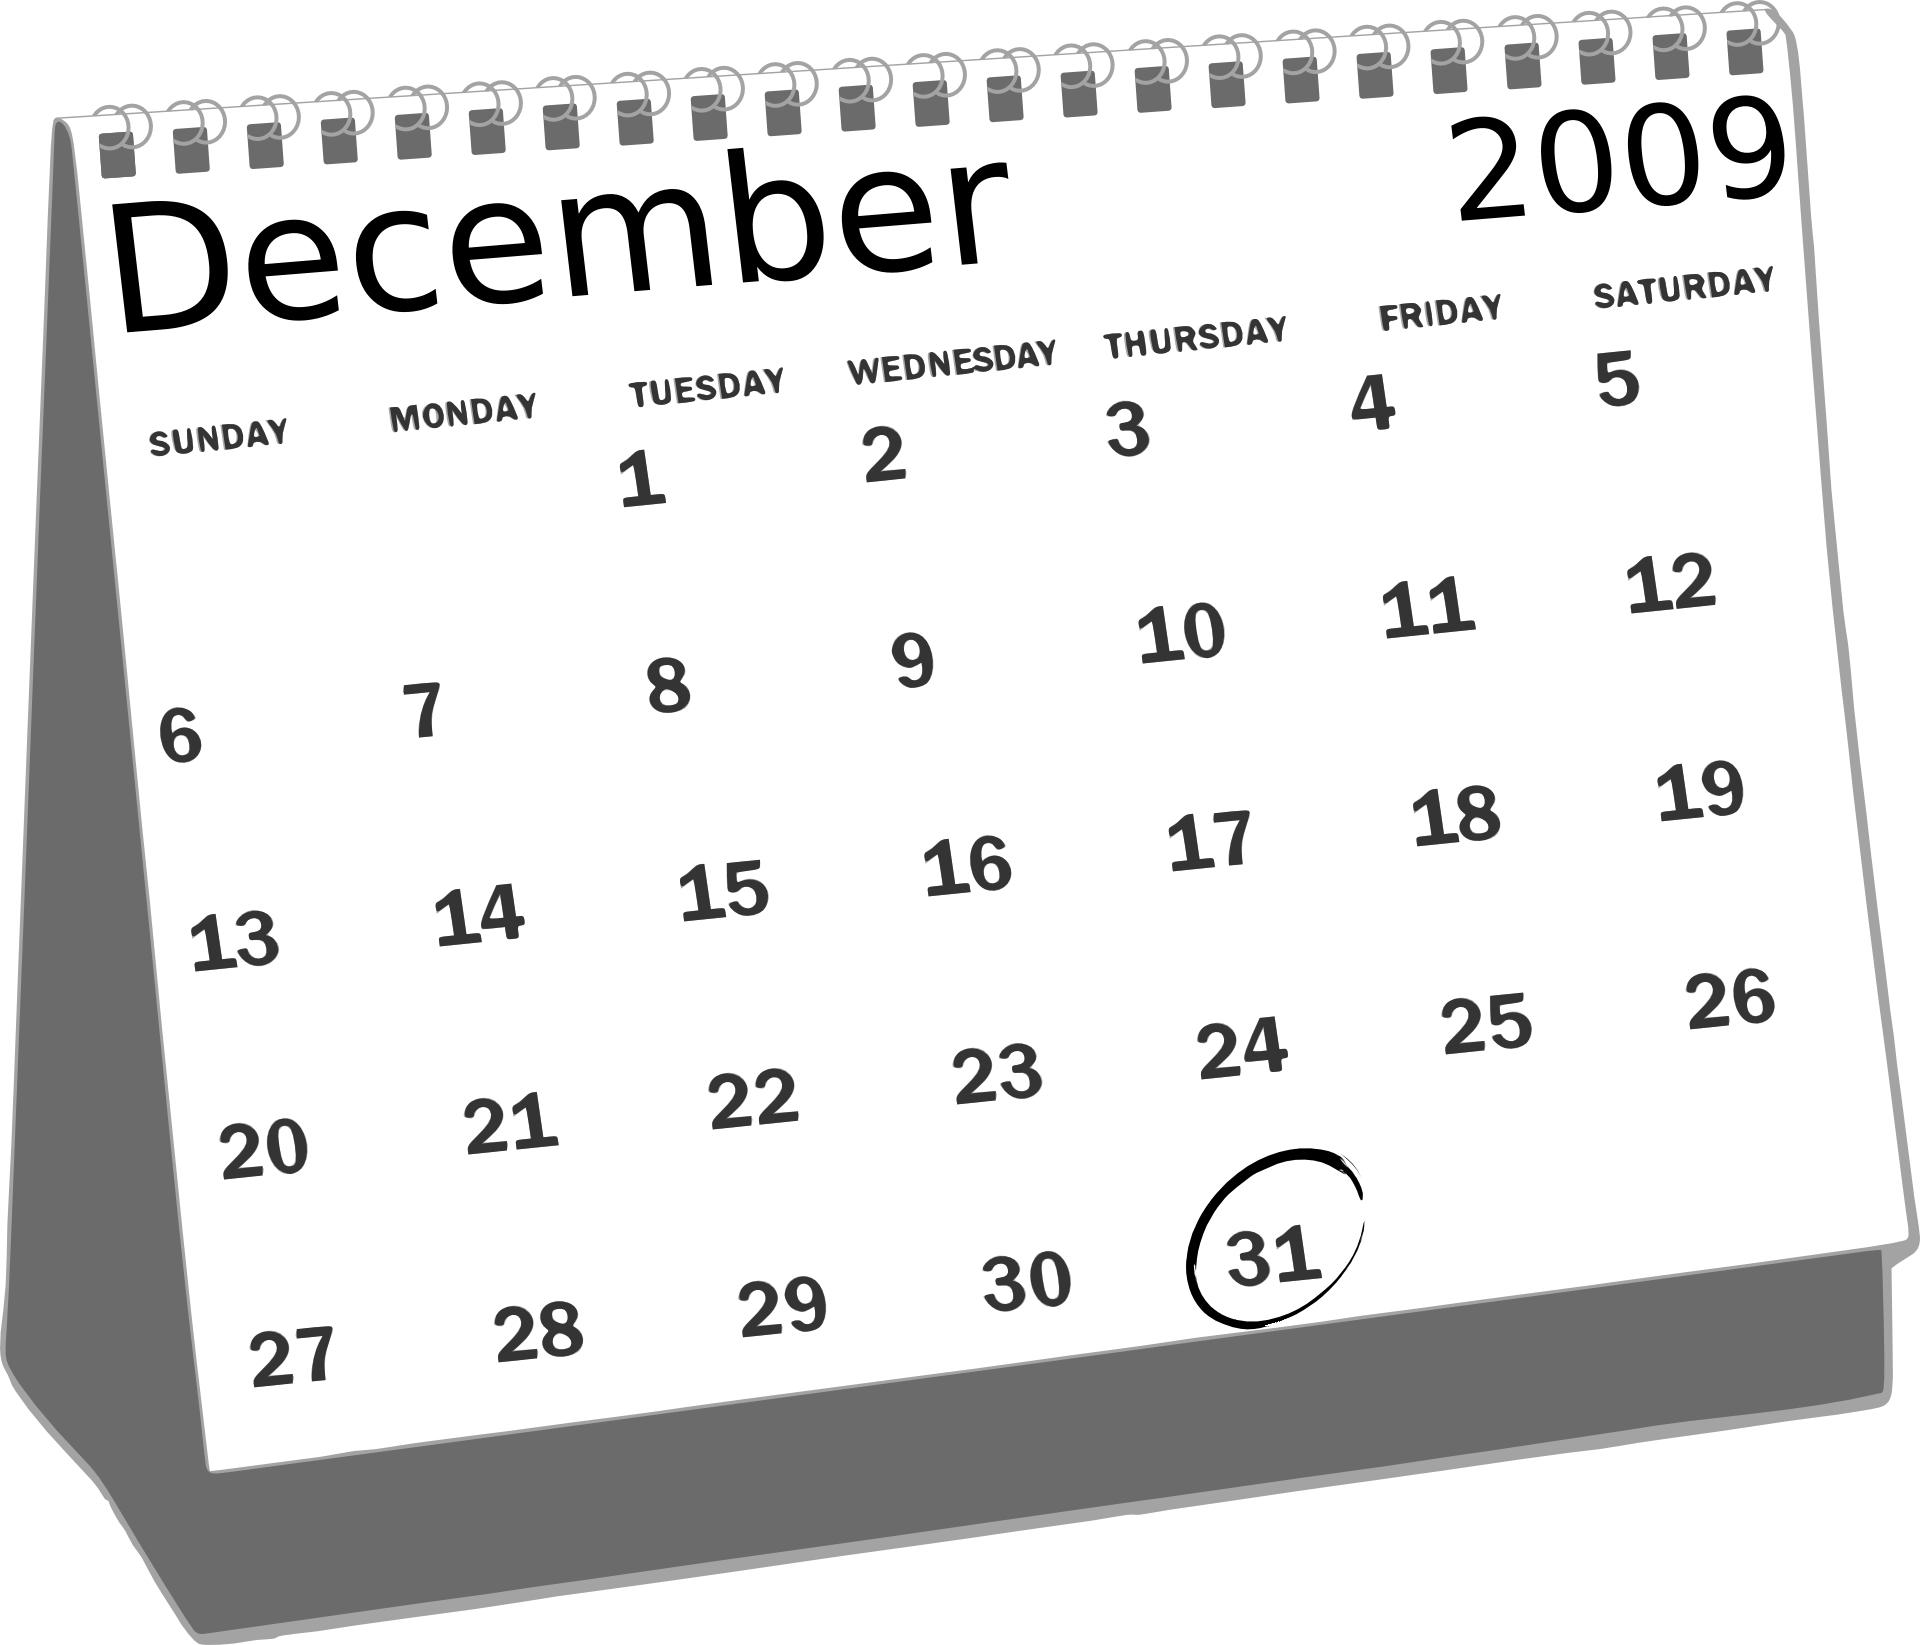 December simple calendar clipart clip art freeuse download December simple calendar clipart - ClipartFest clip art freeuse download